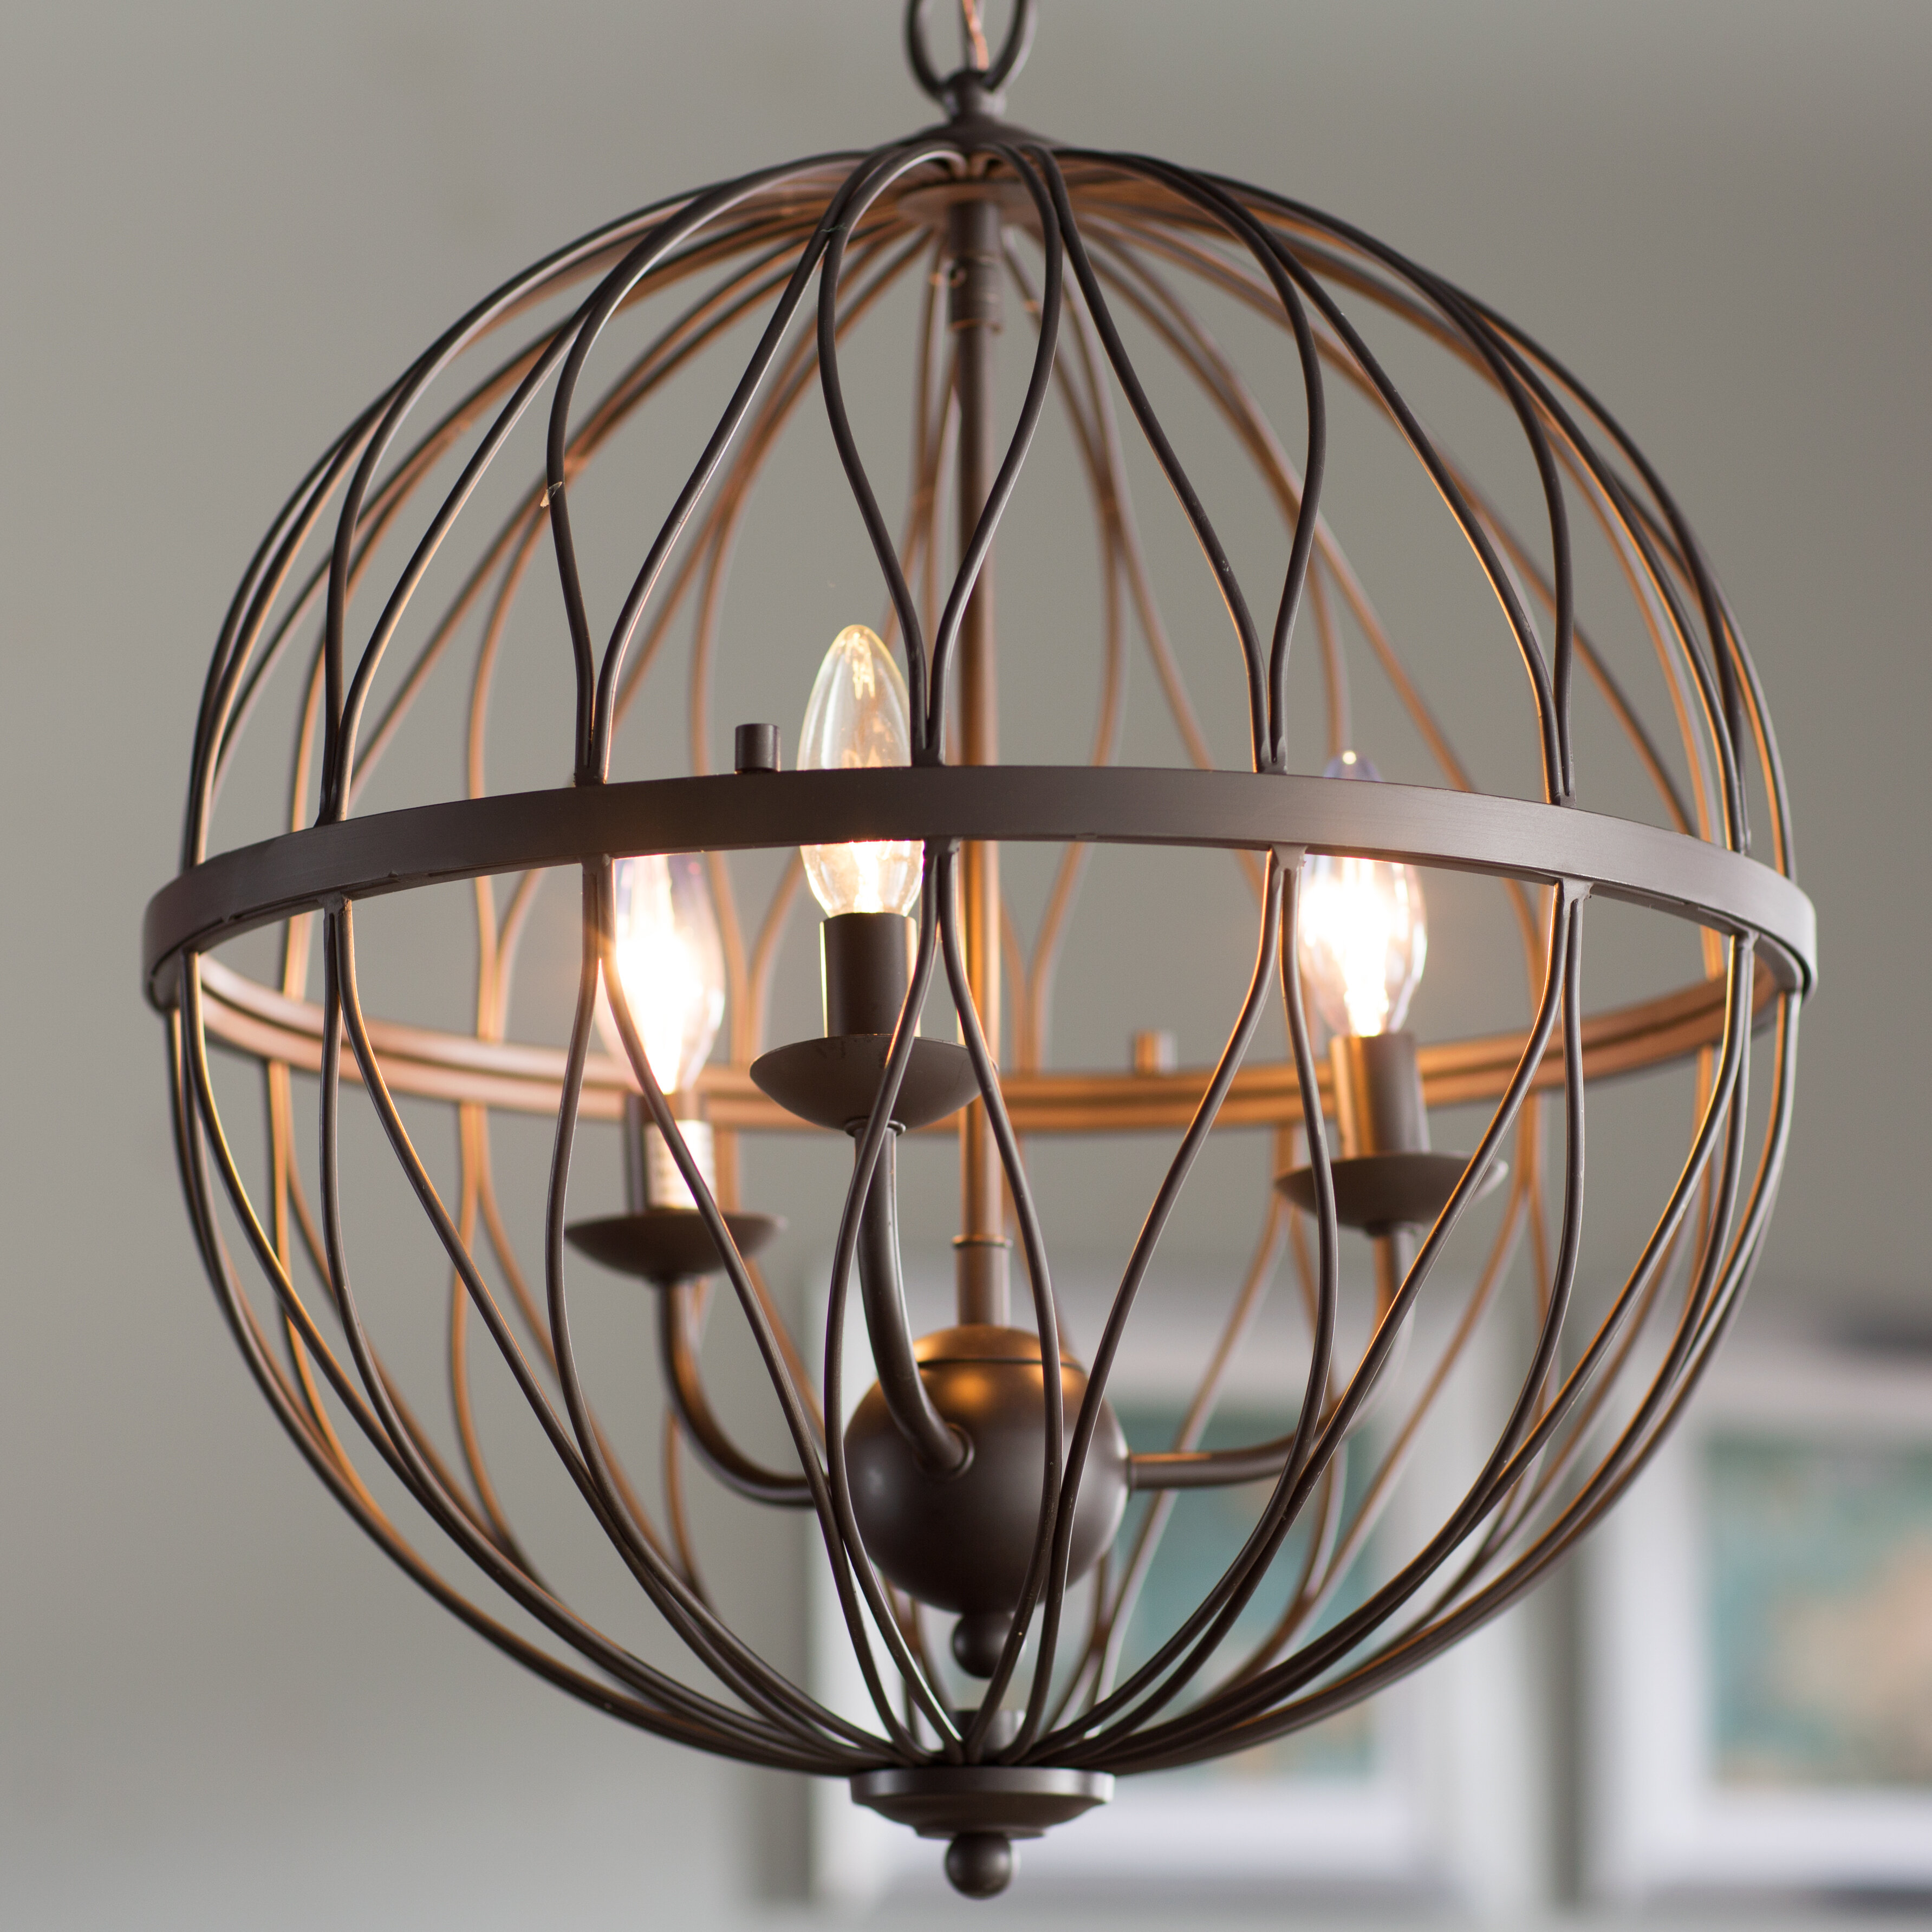 sphere lighting fixture. Sphere Lighting Fixture U